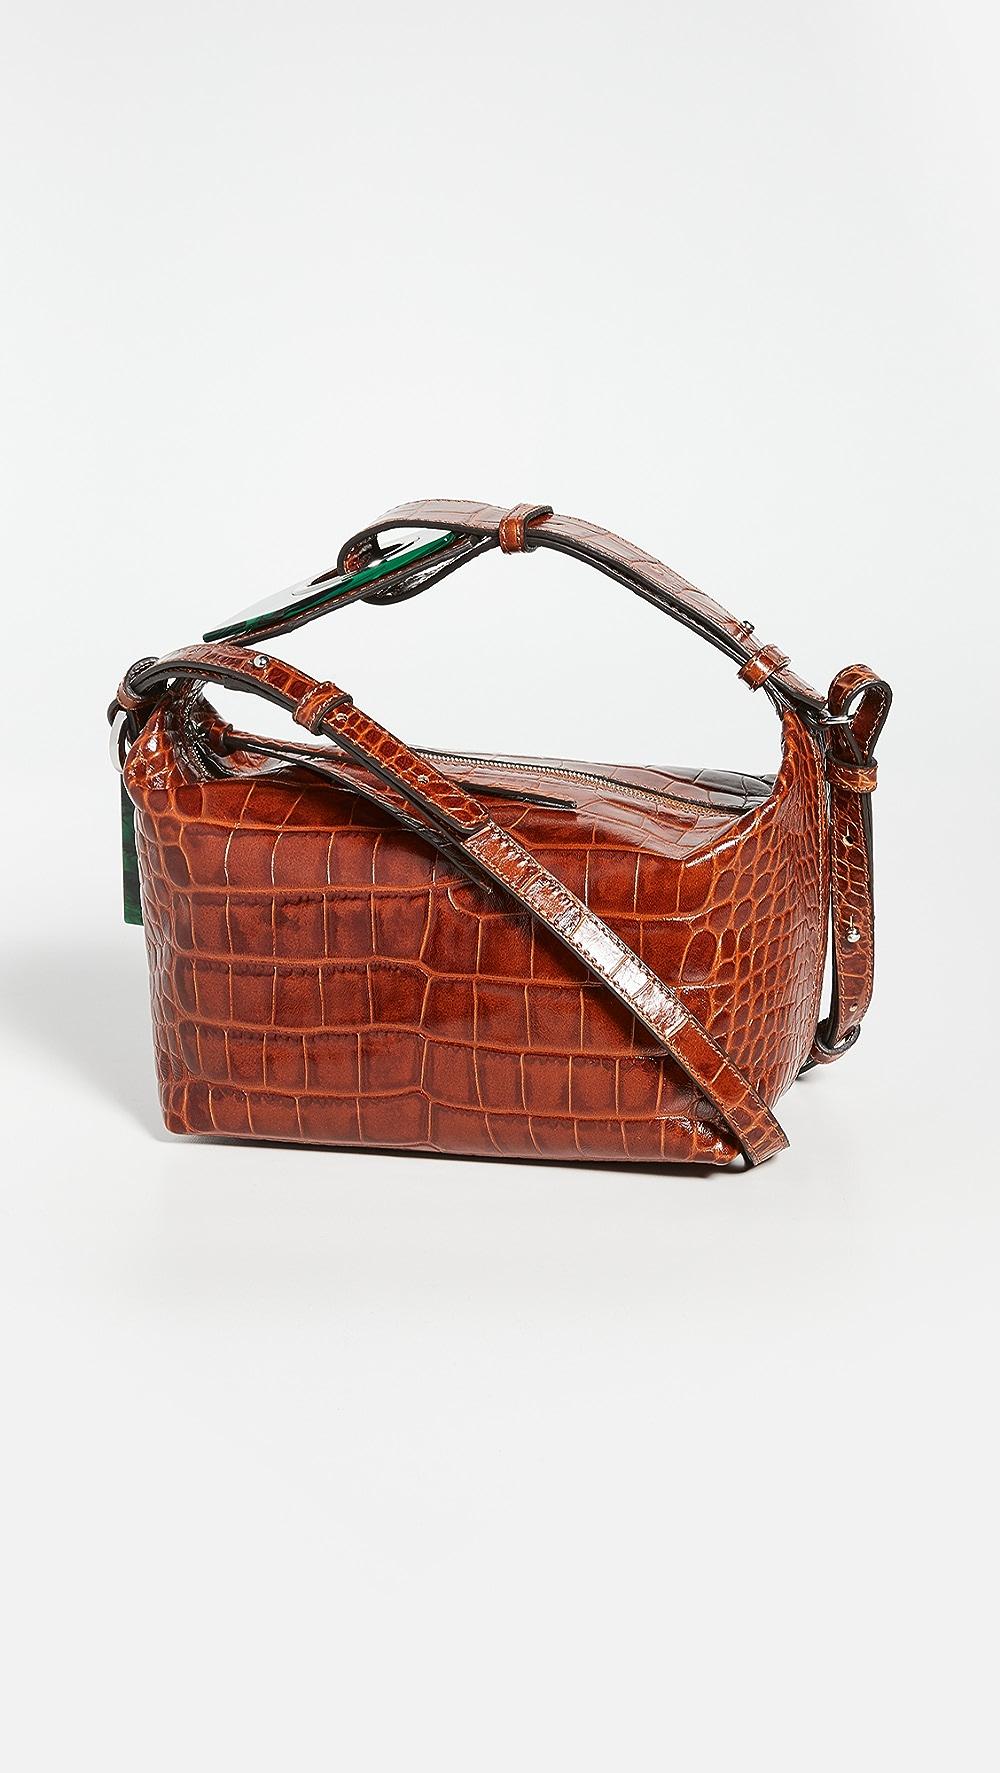 Precise Ganni - Embossed Shoulder Bag Perfect In Workmanship